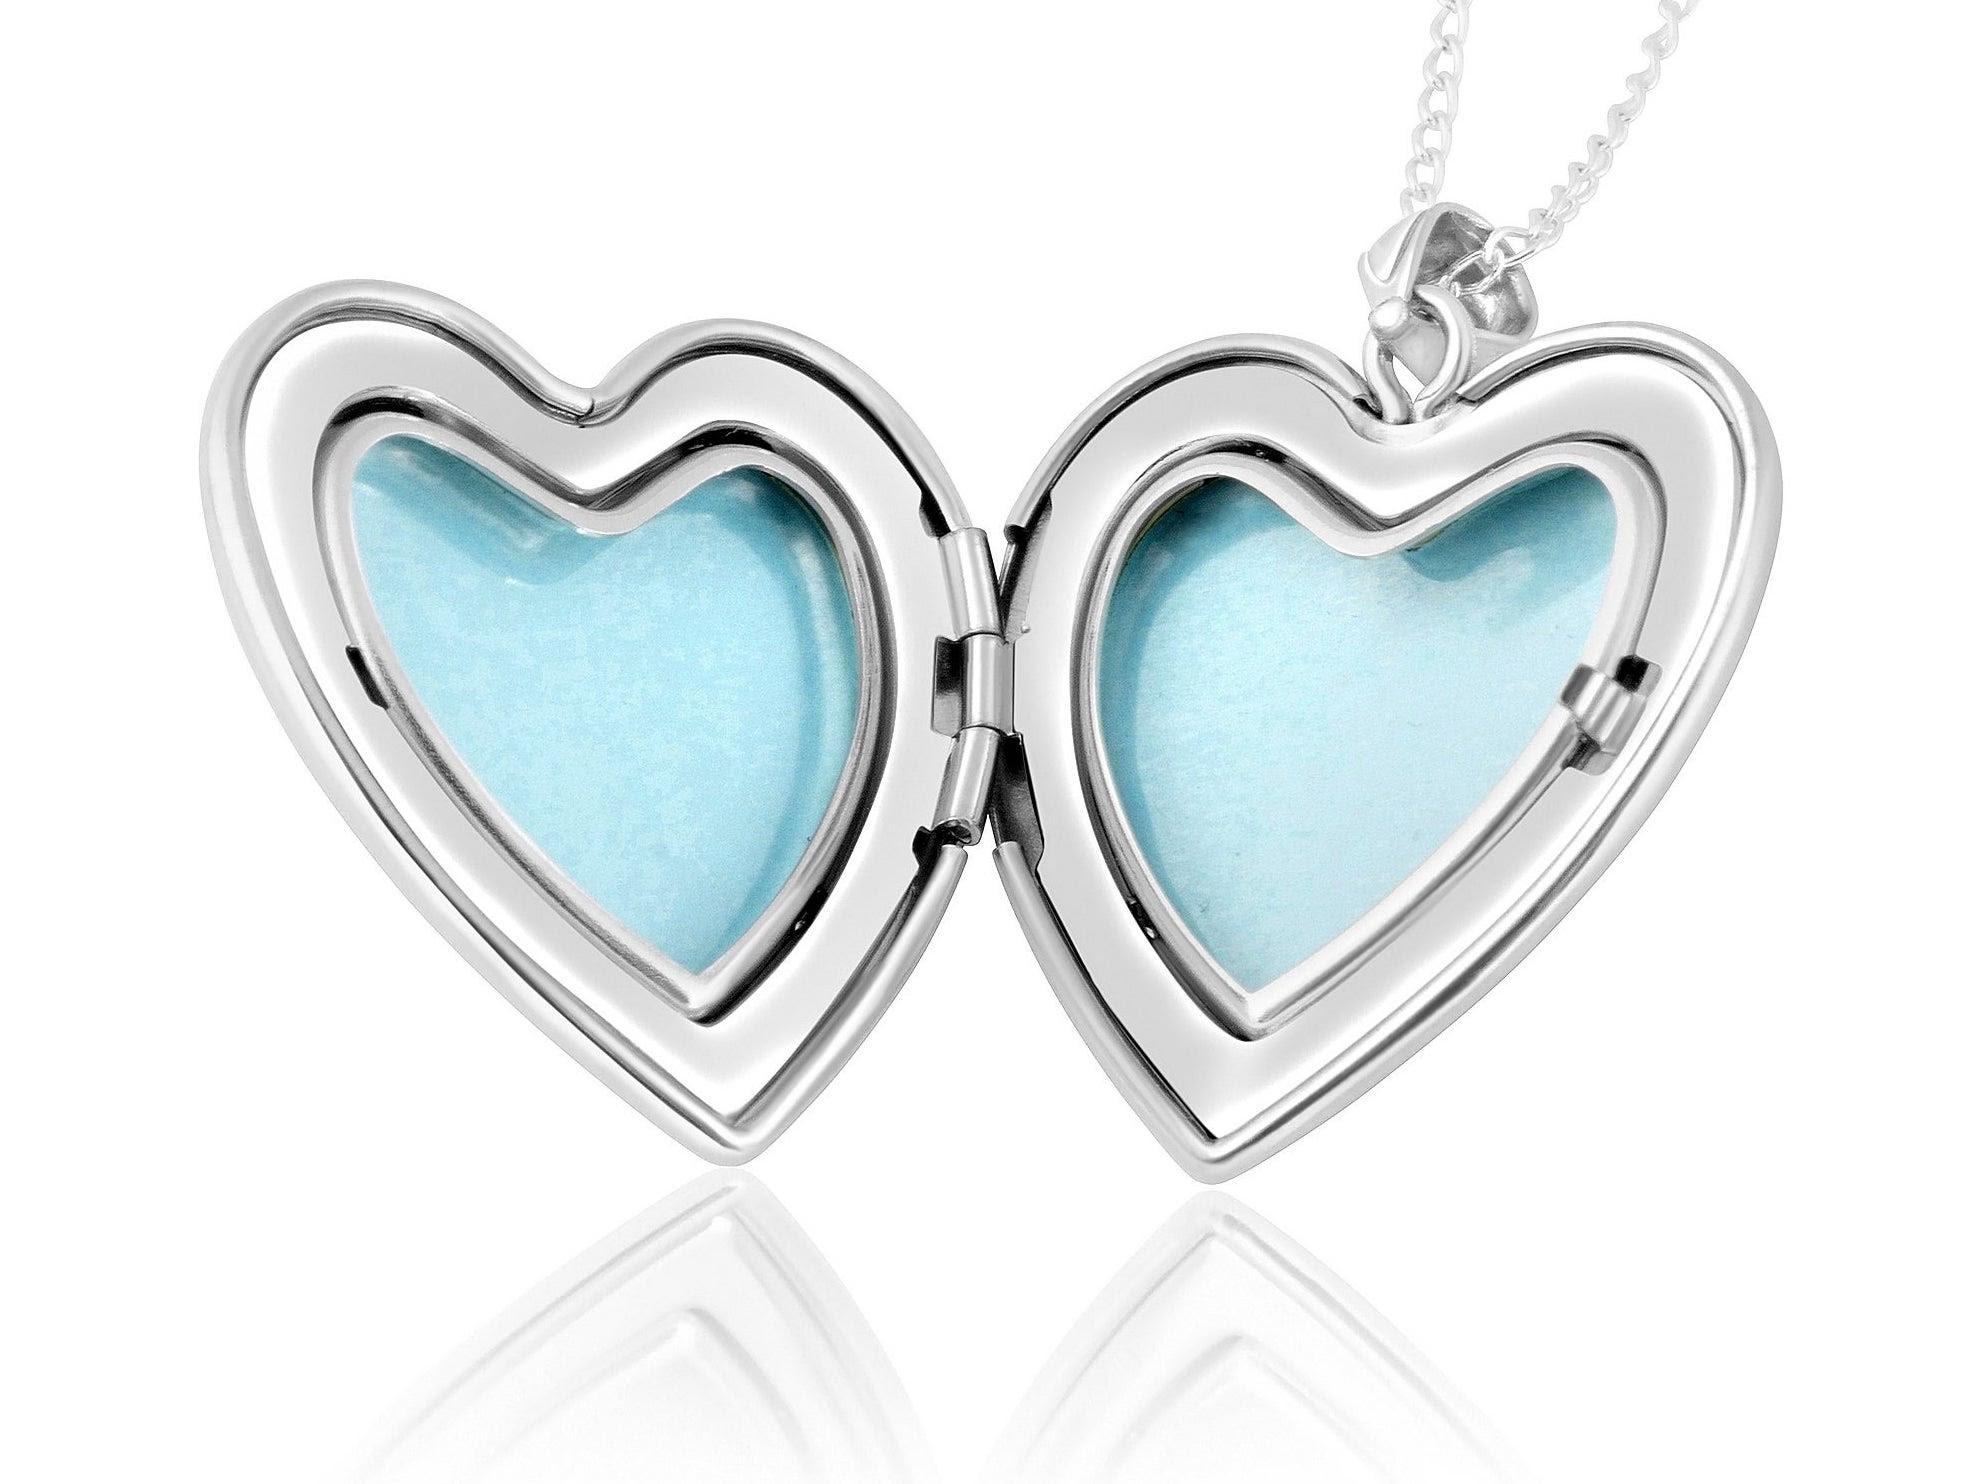 sterling-silver-dog-paw-prints-heart-shape-fashion-locket-pendant-1651412c-10d6-451d-8be9-9922c62fb312.jpg